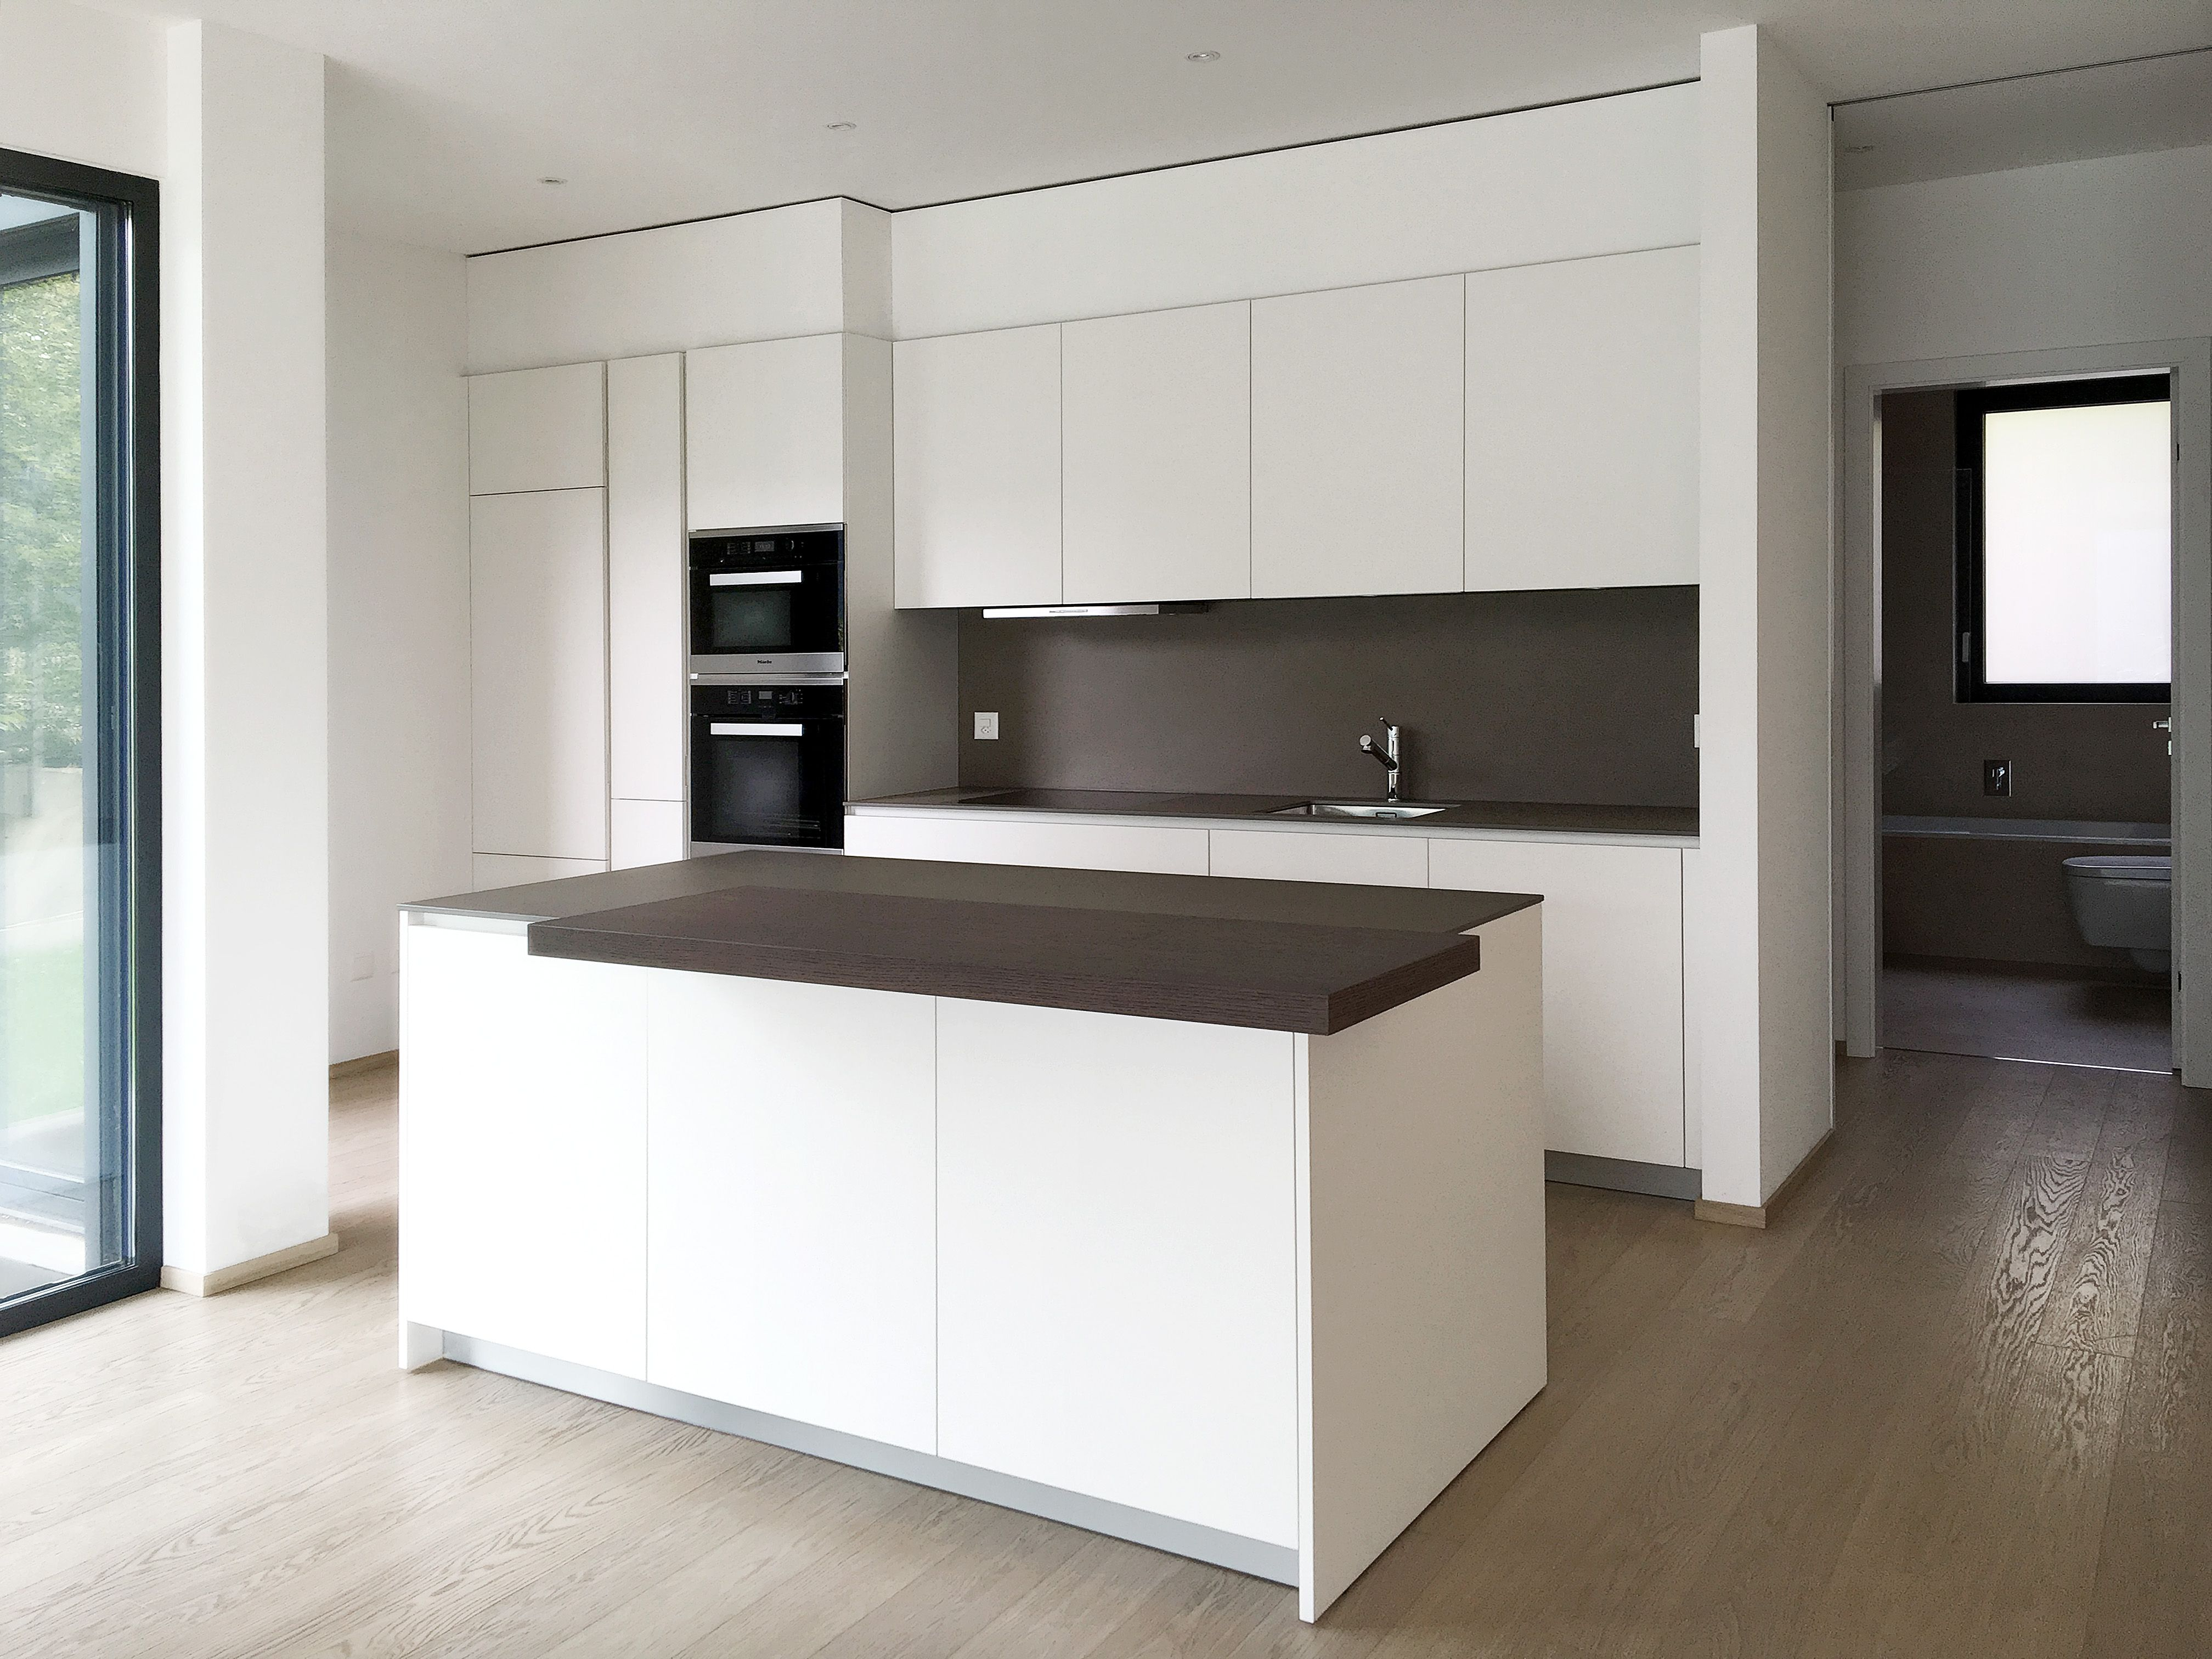 cucina design varenna poliform laccata bianca con piano in ... - Varenna Cucina